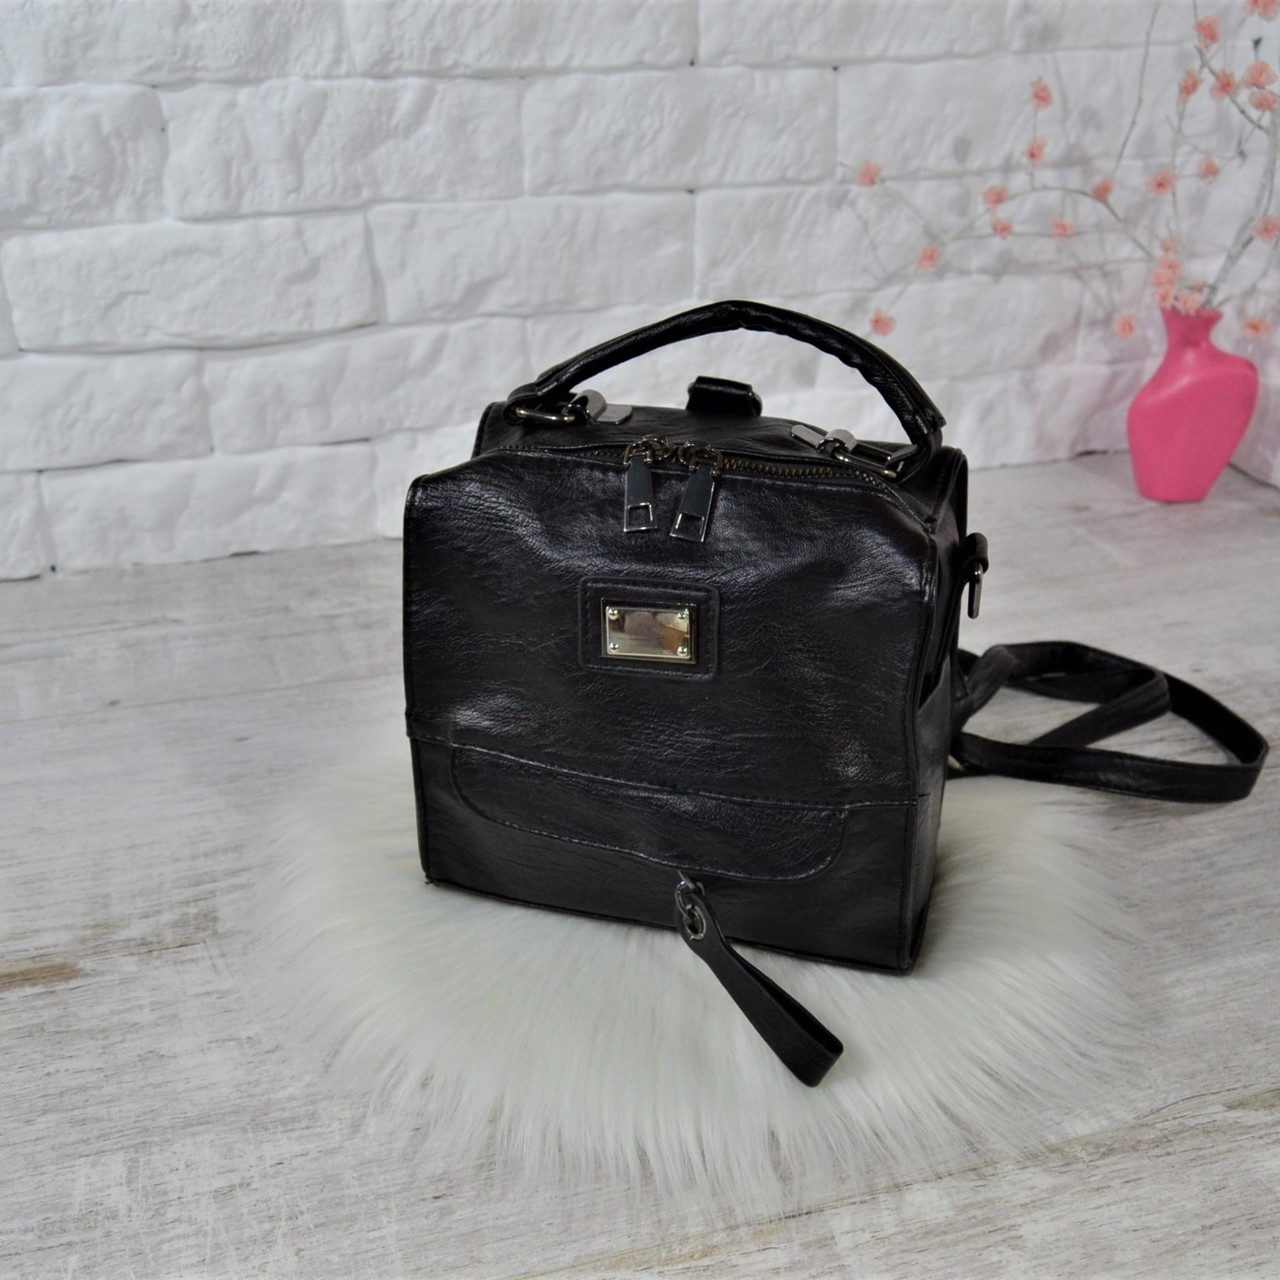 Сумка-рюкзак Fashion Lusha Компакт городская черная